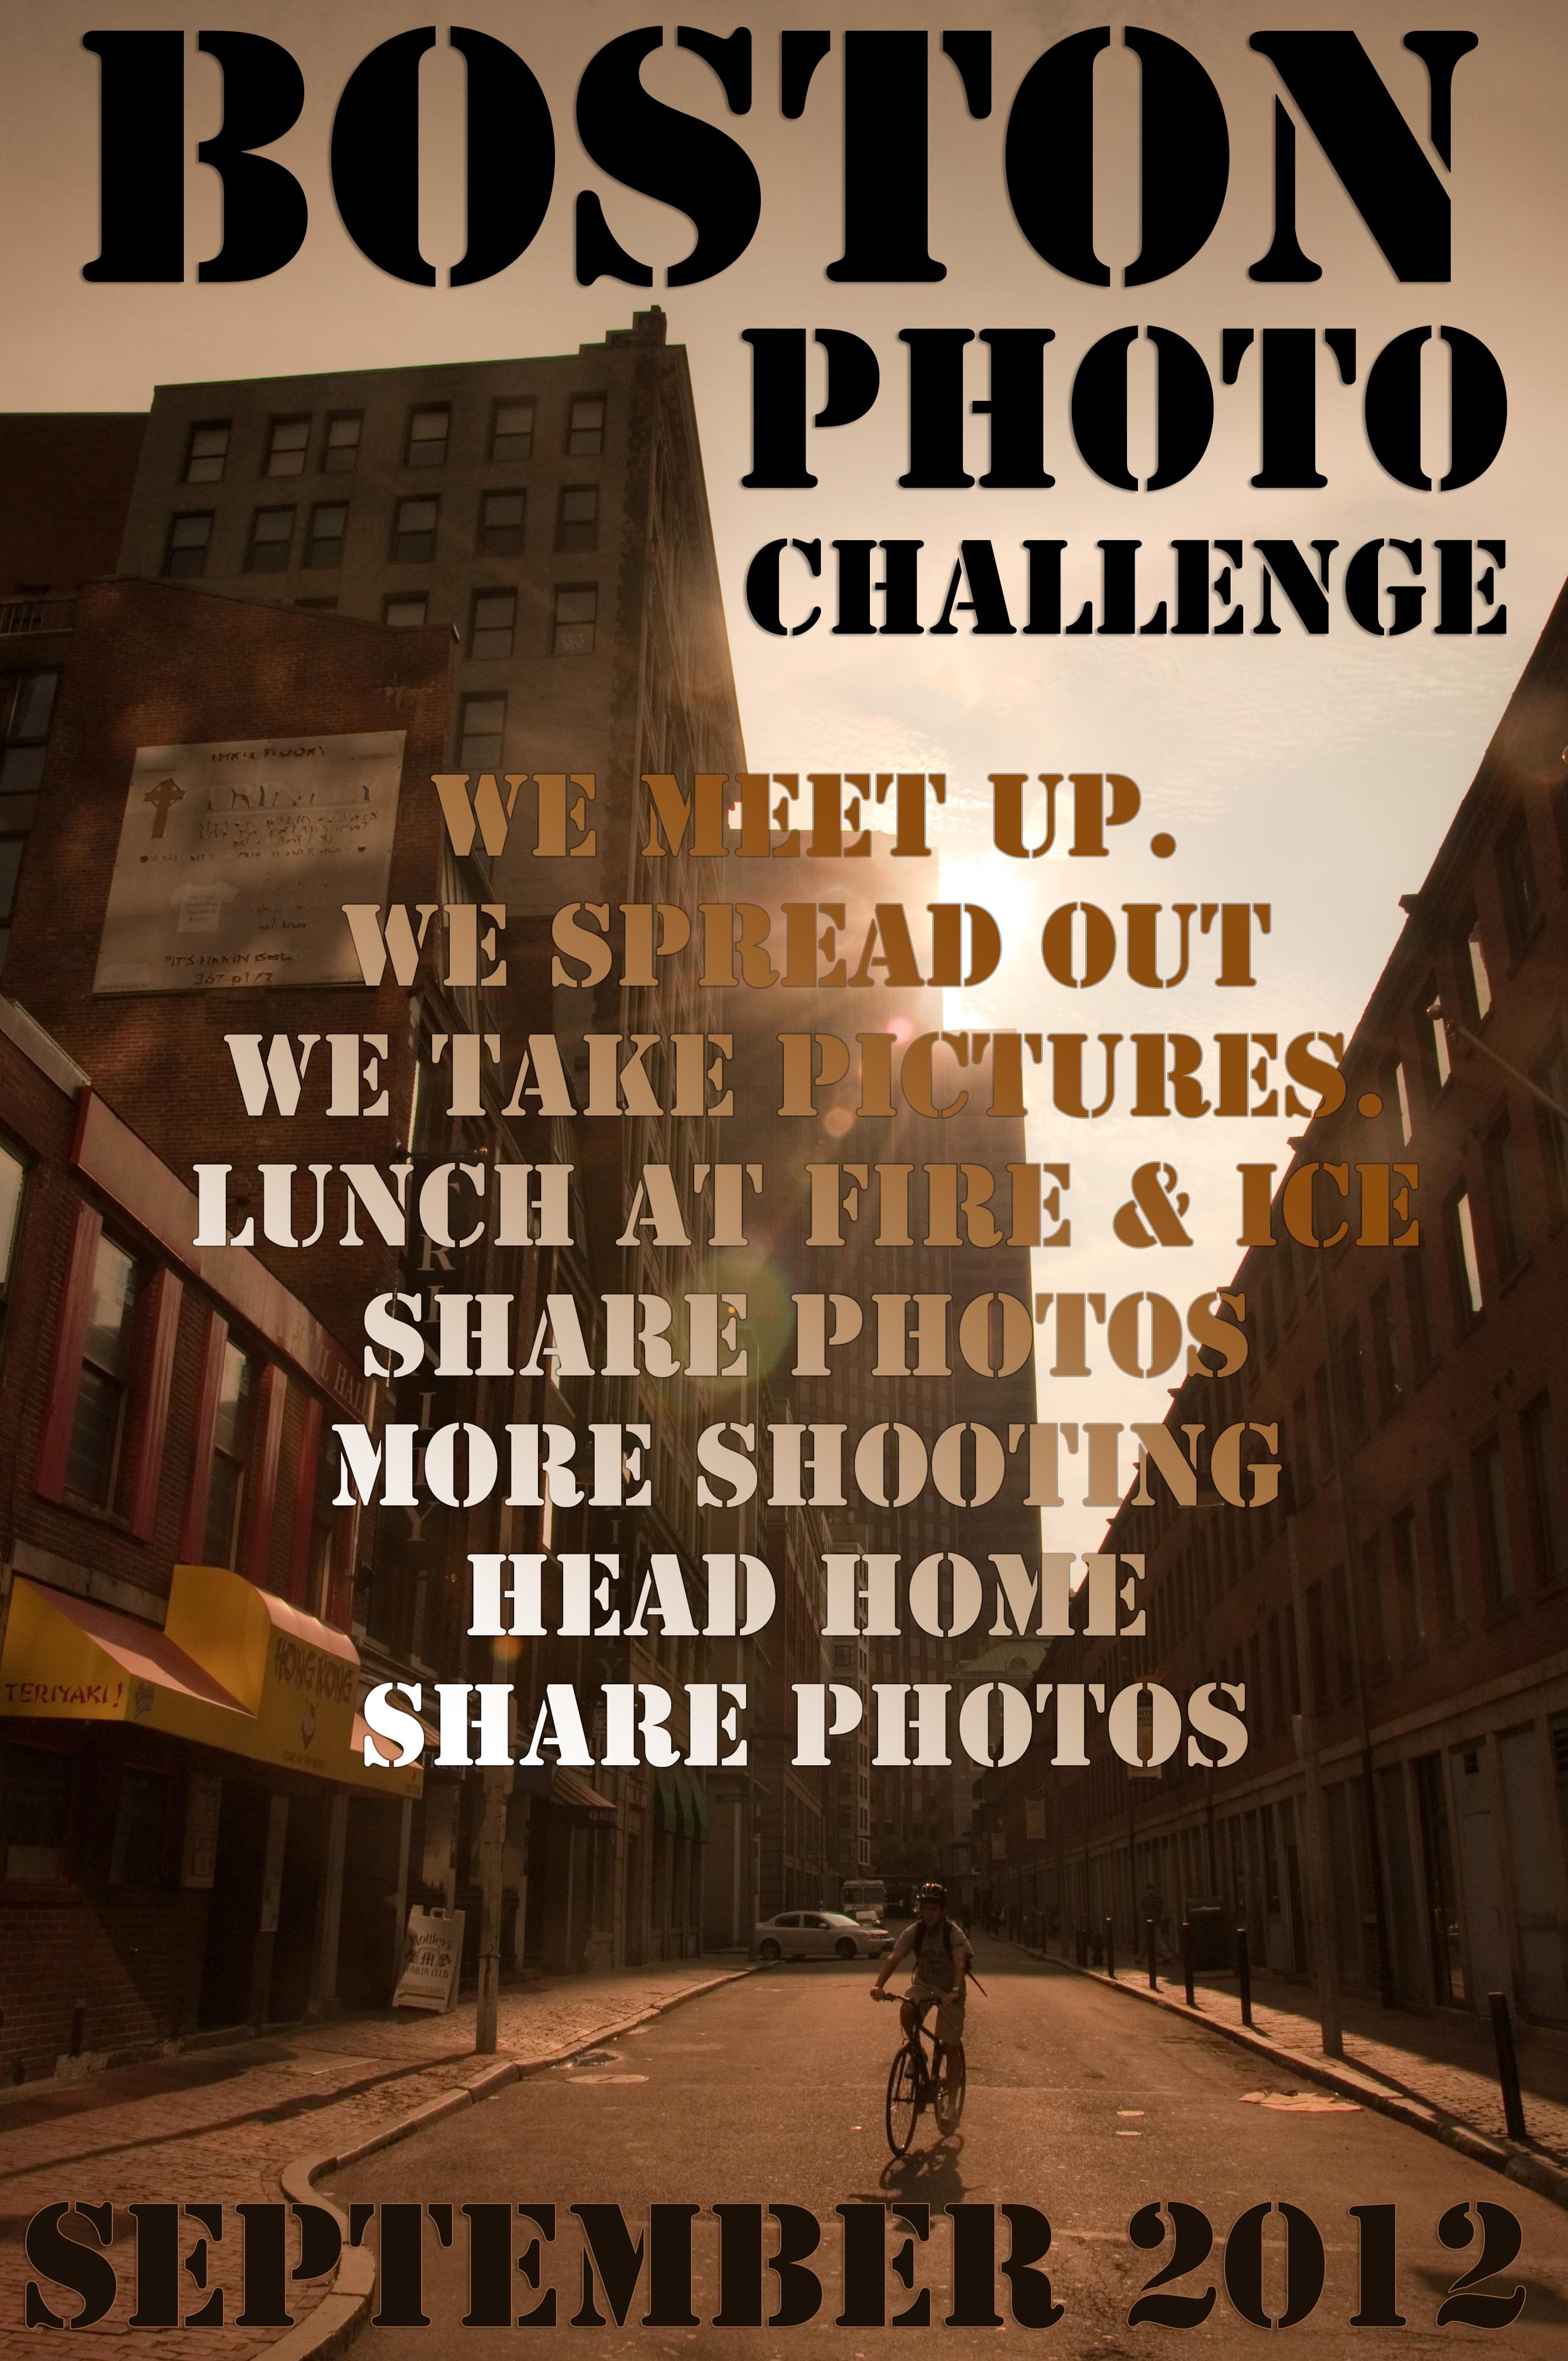 Boston challenge.jpg